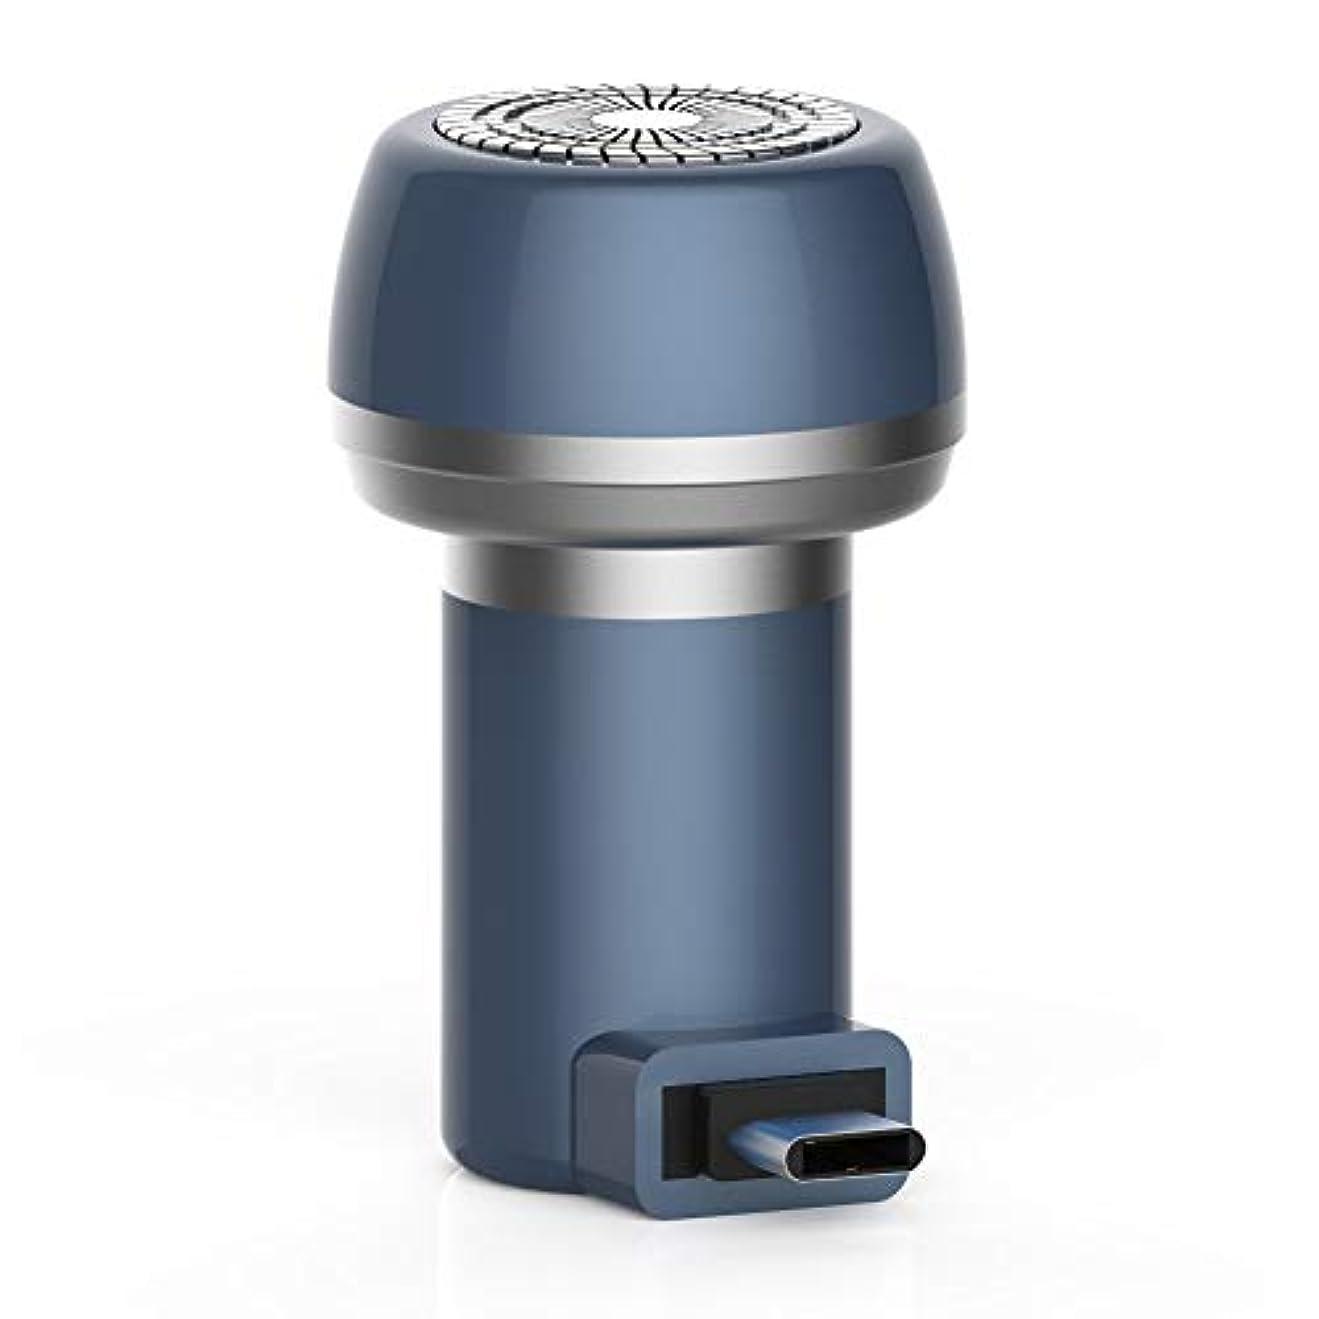 CatChi 磁気電気シェーバーミニポータブルType-C USB防水剃刀